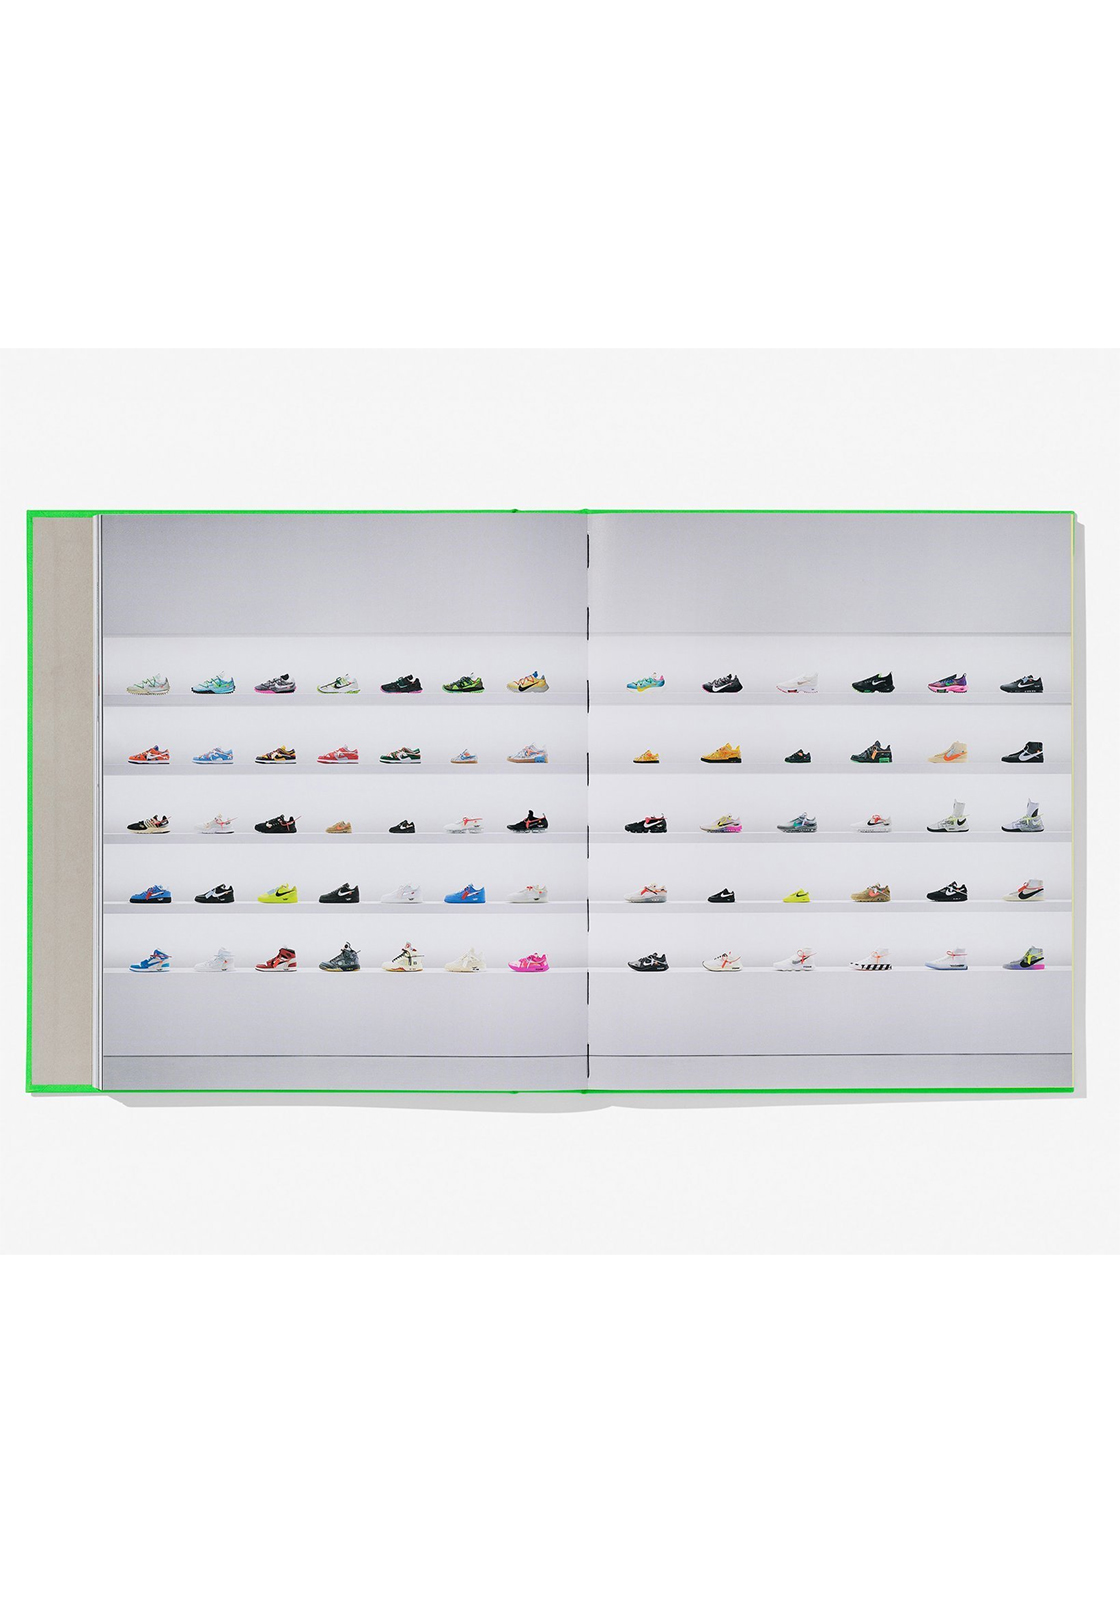 Virgil Abloh  | Nike  ICONS